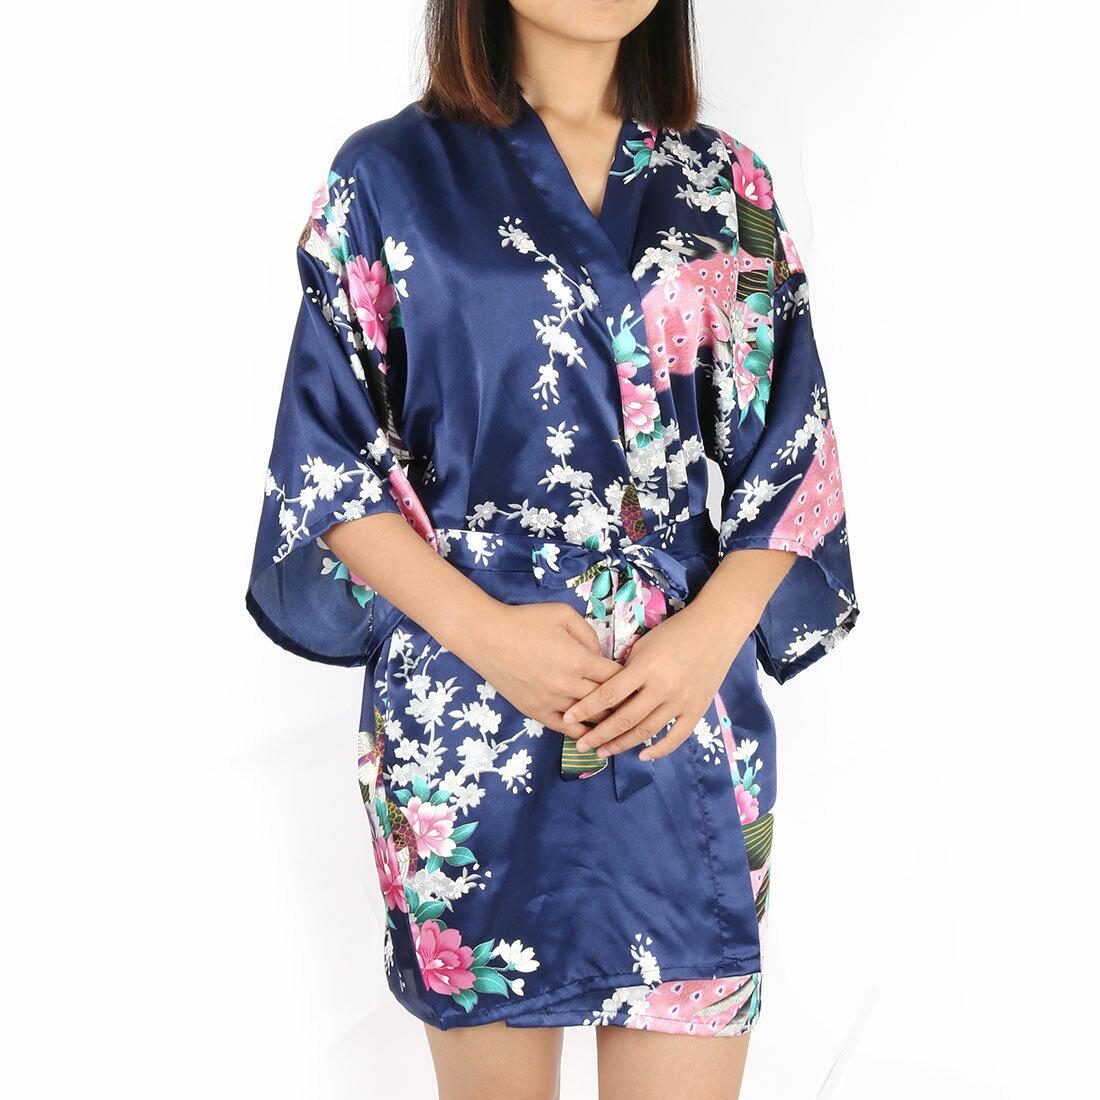 Unique Bargains  Women s Satin Short Kimono Robes for Wedding Party ... 30f058b20